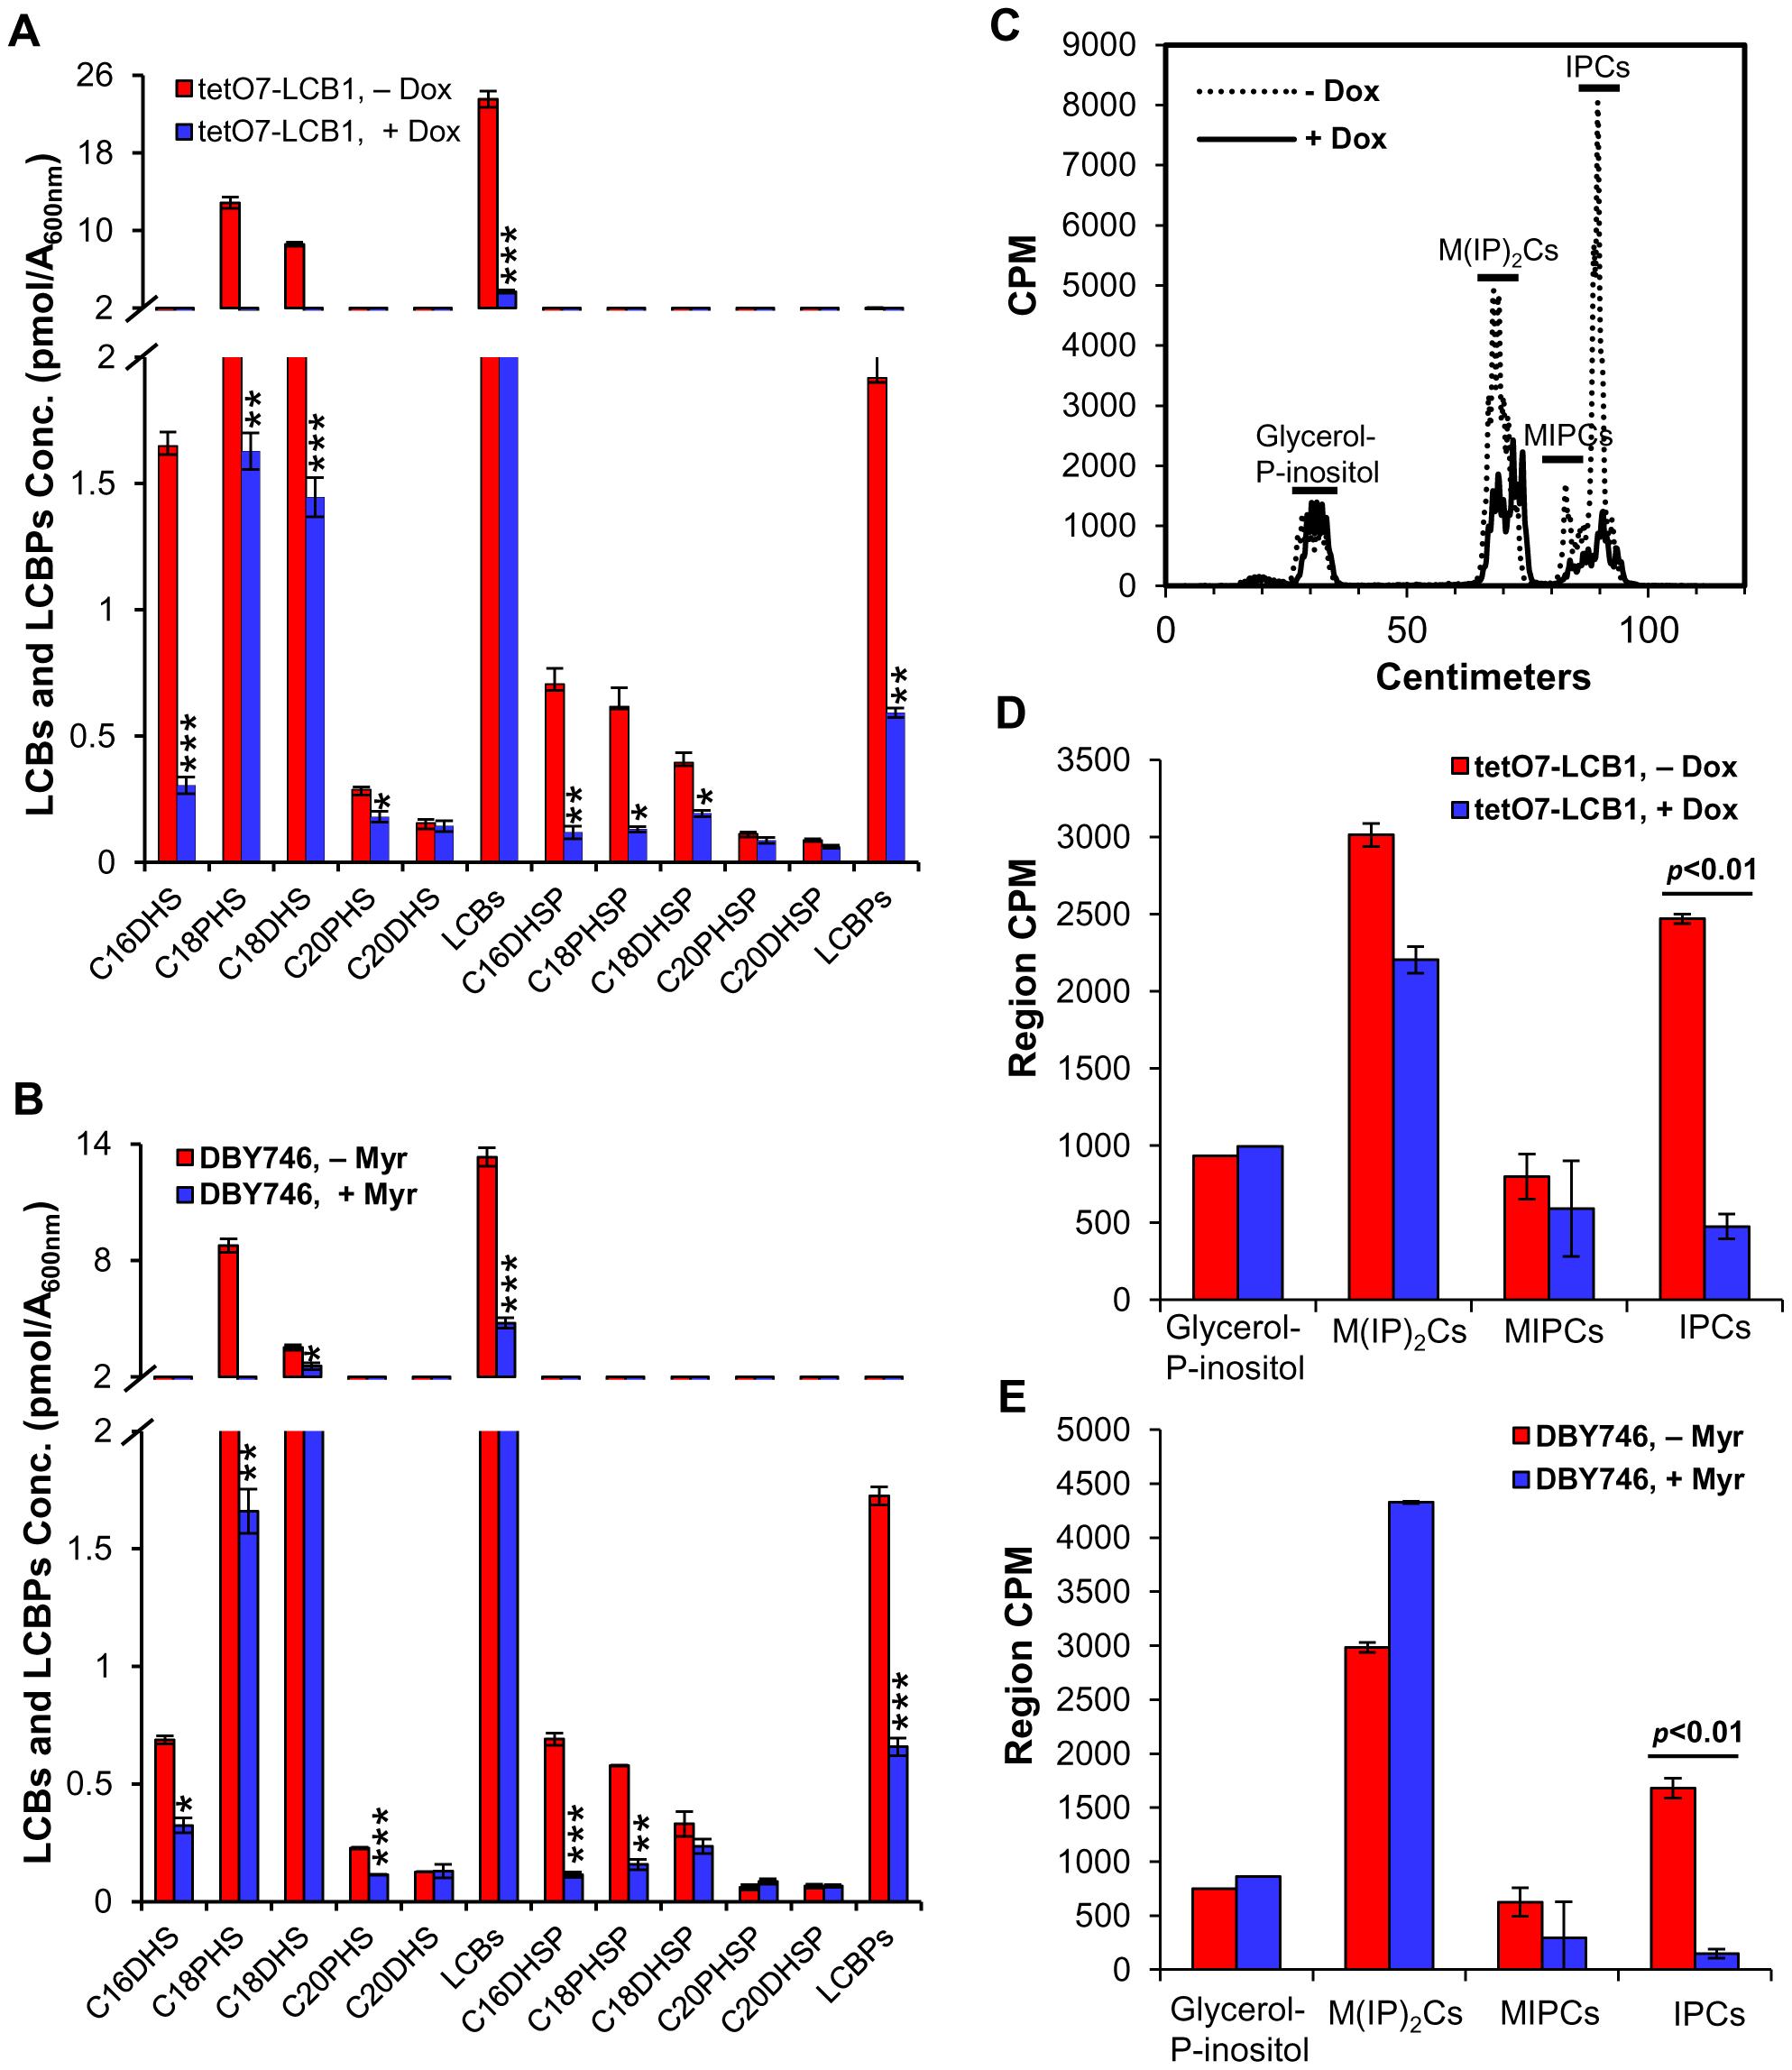 Myriocin or Dox treatment reduces sphingolipid levels.